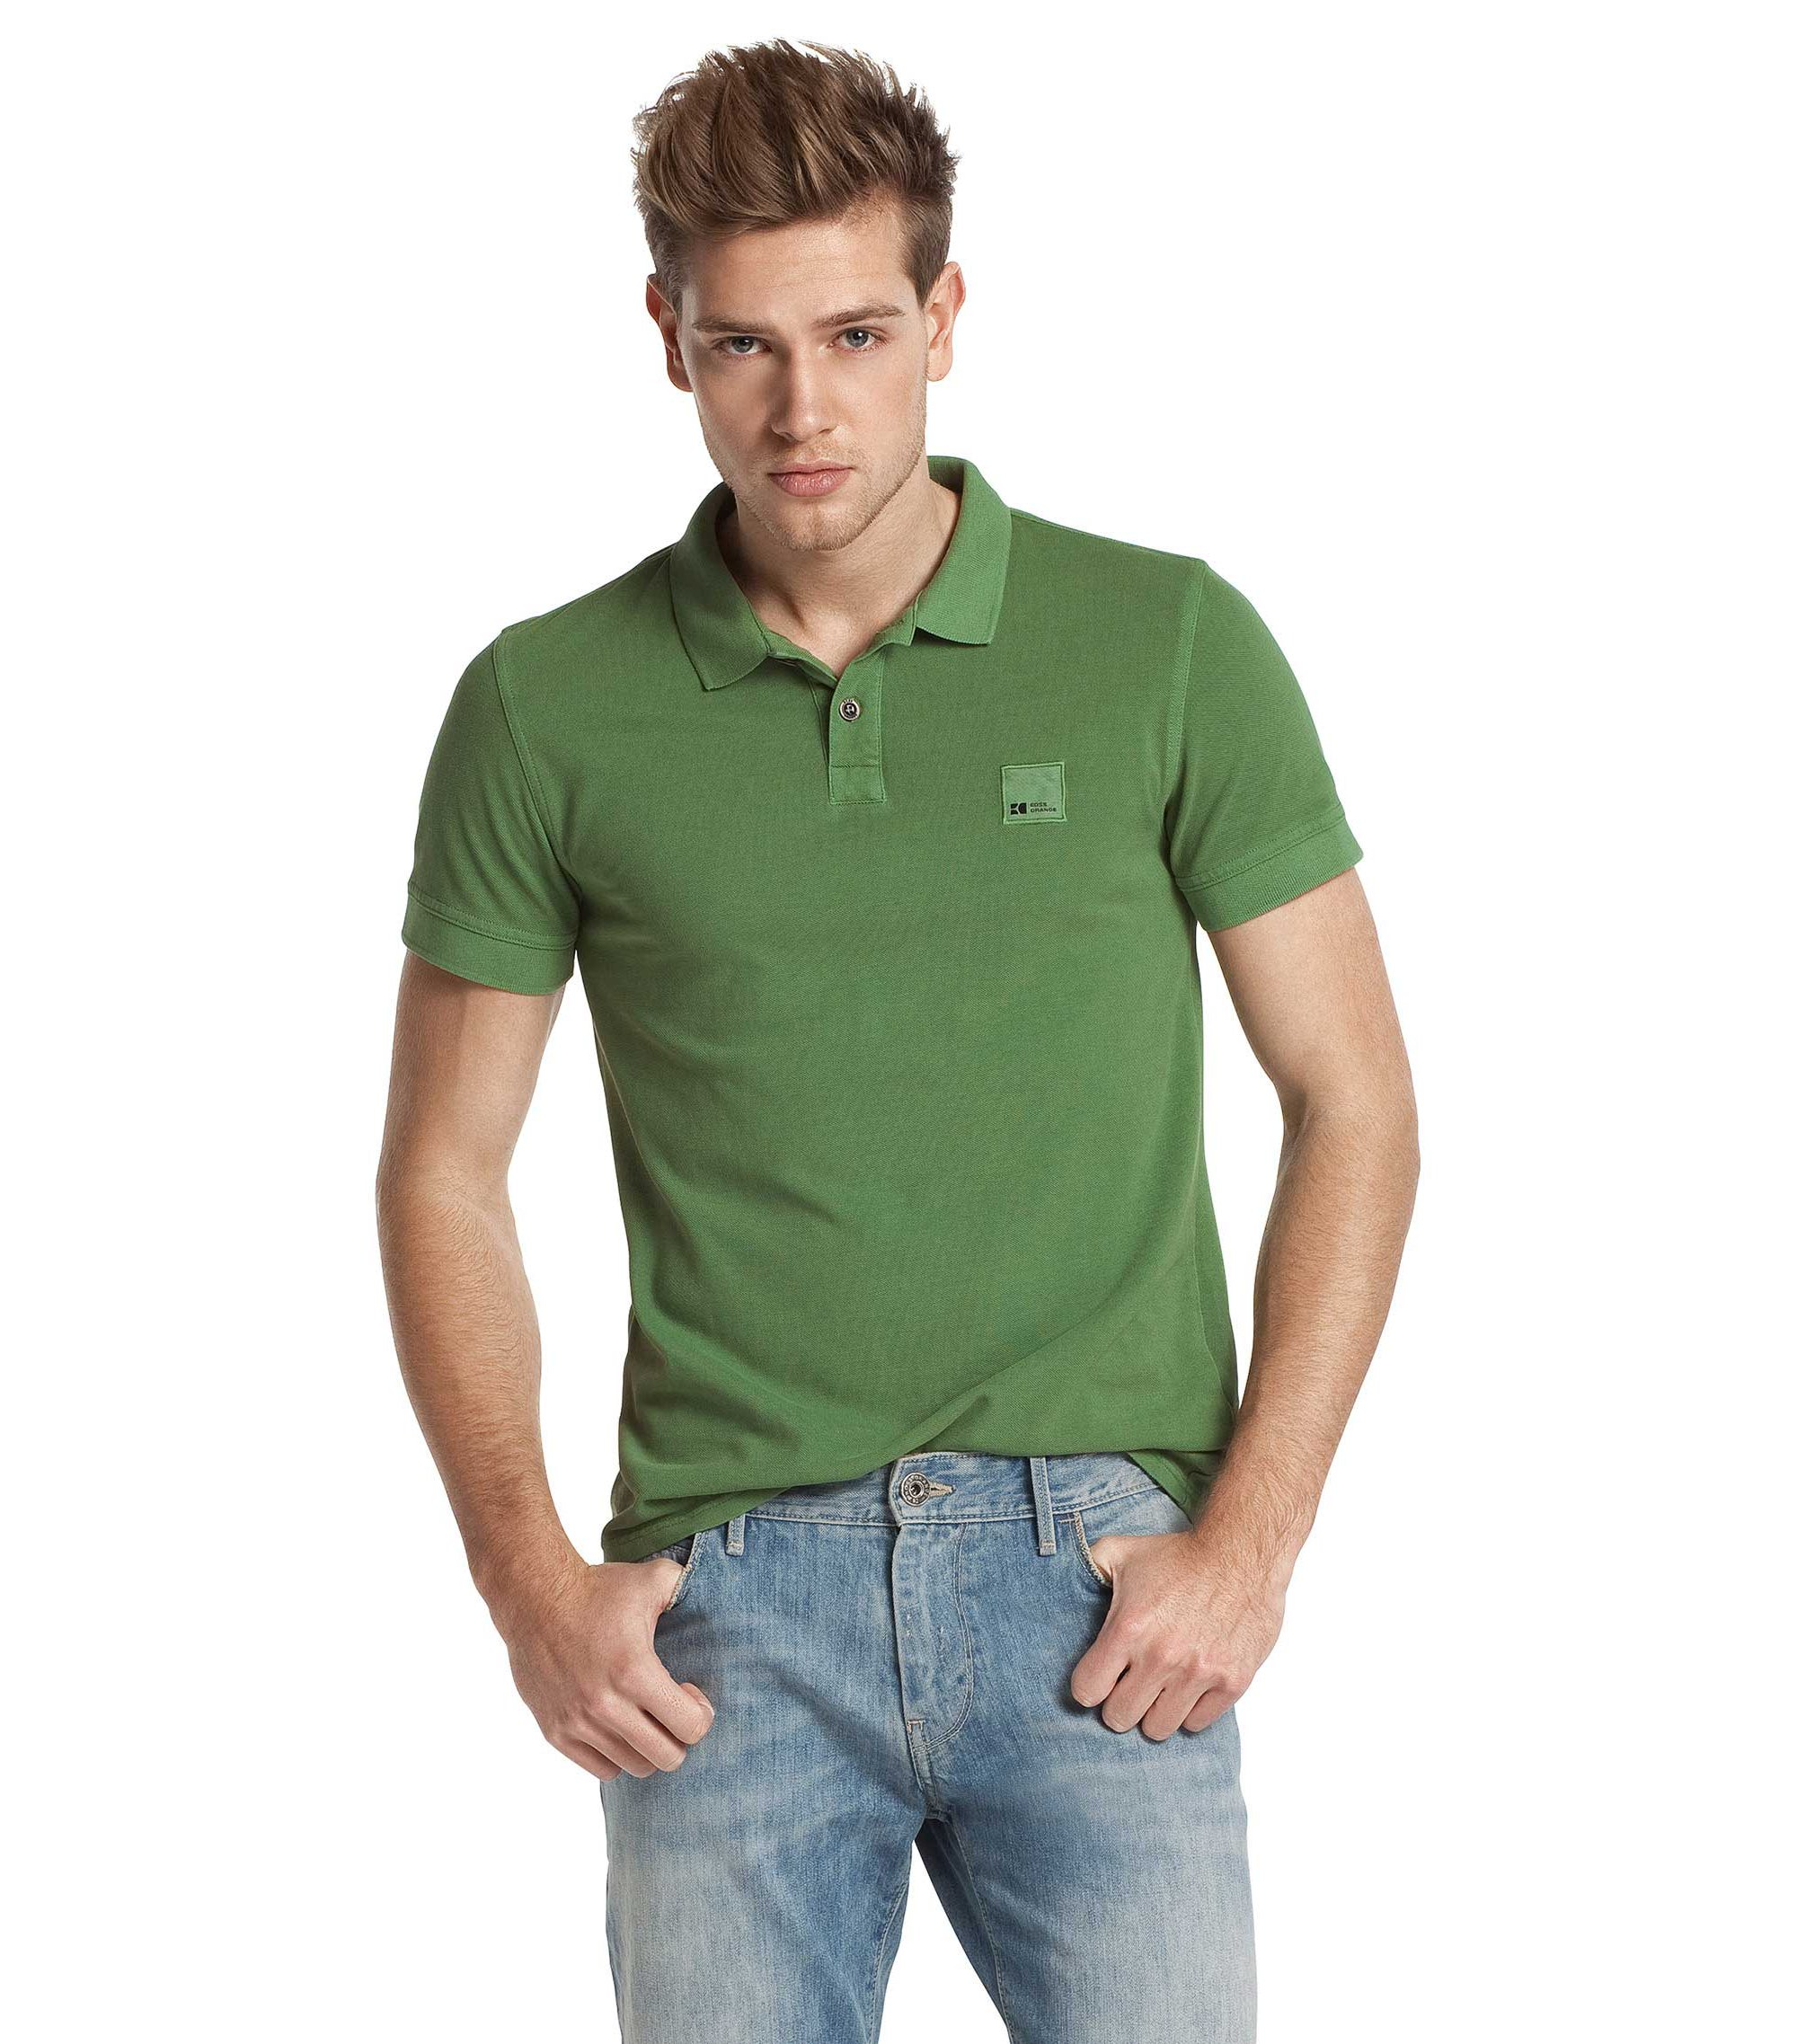 Kurzarmpolo ´Pascha` aus Baumwolle, Grün